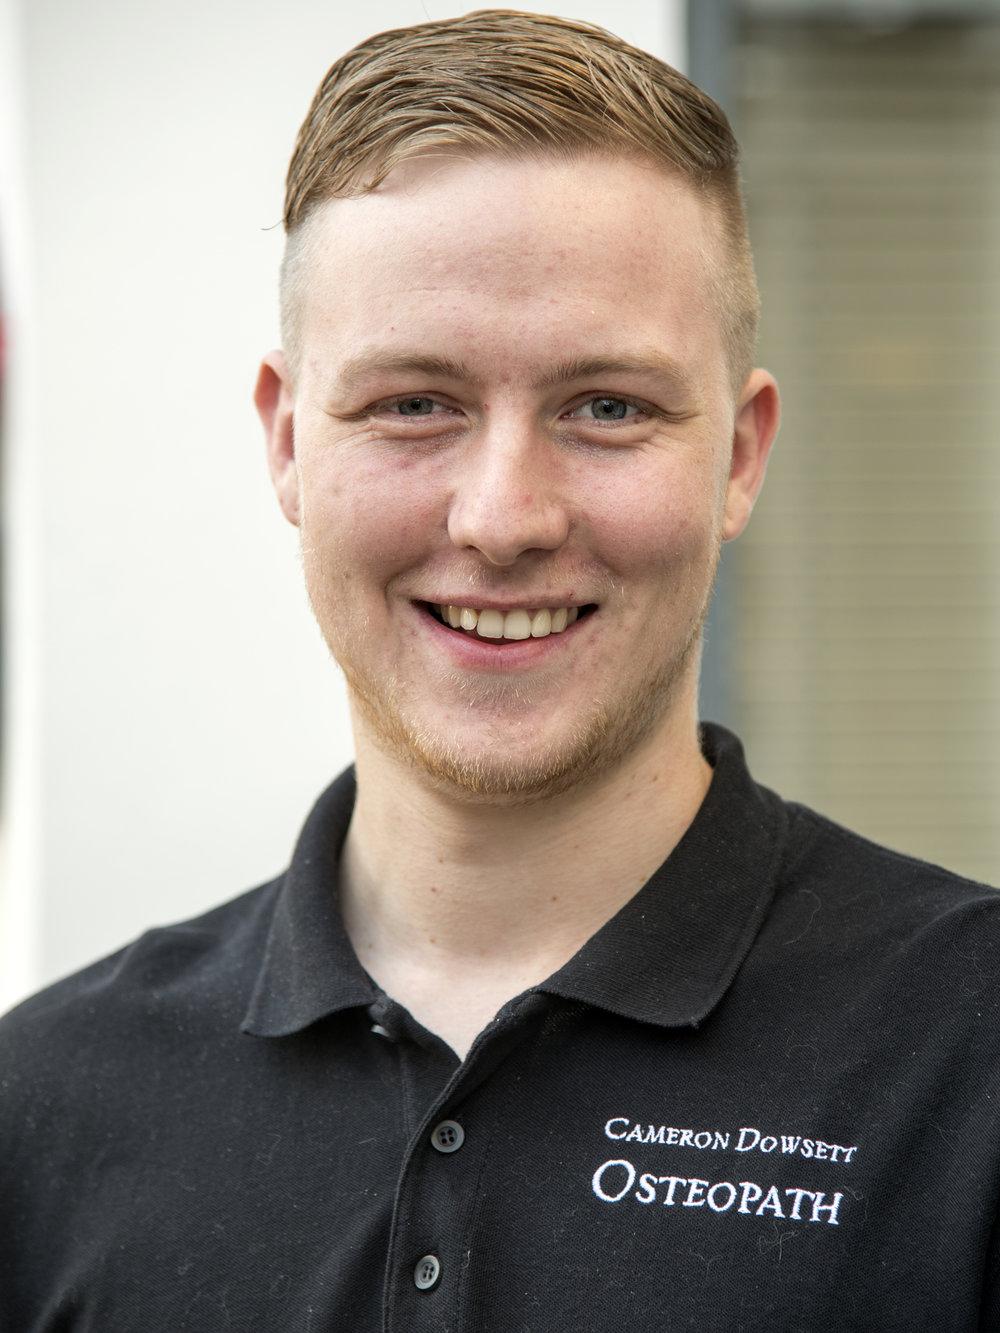 Lewes Osteopath Cameron Dowsett